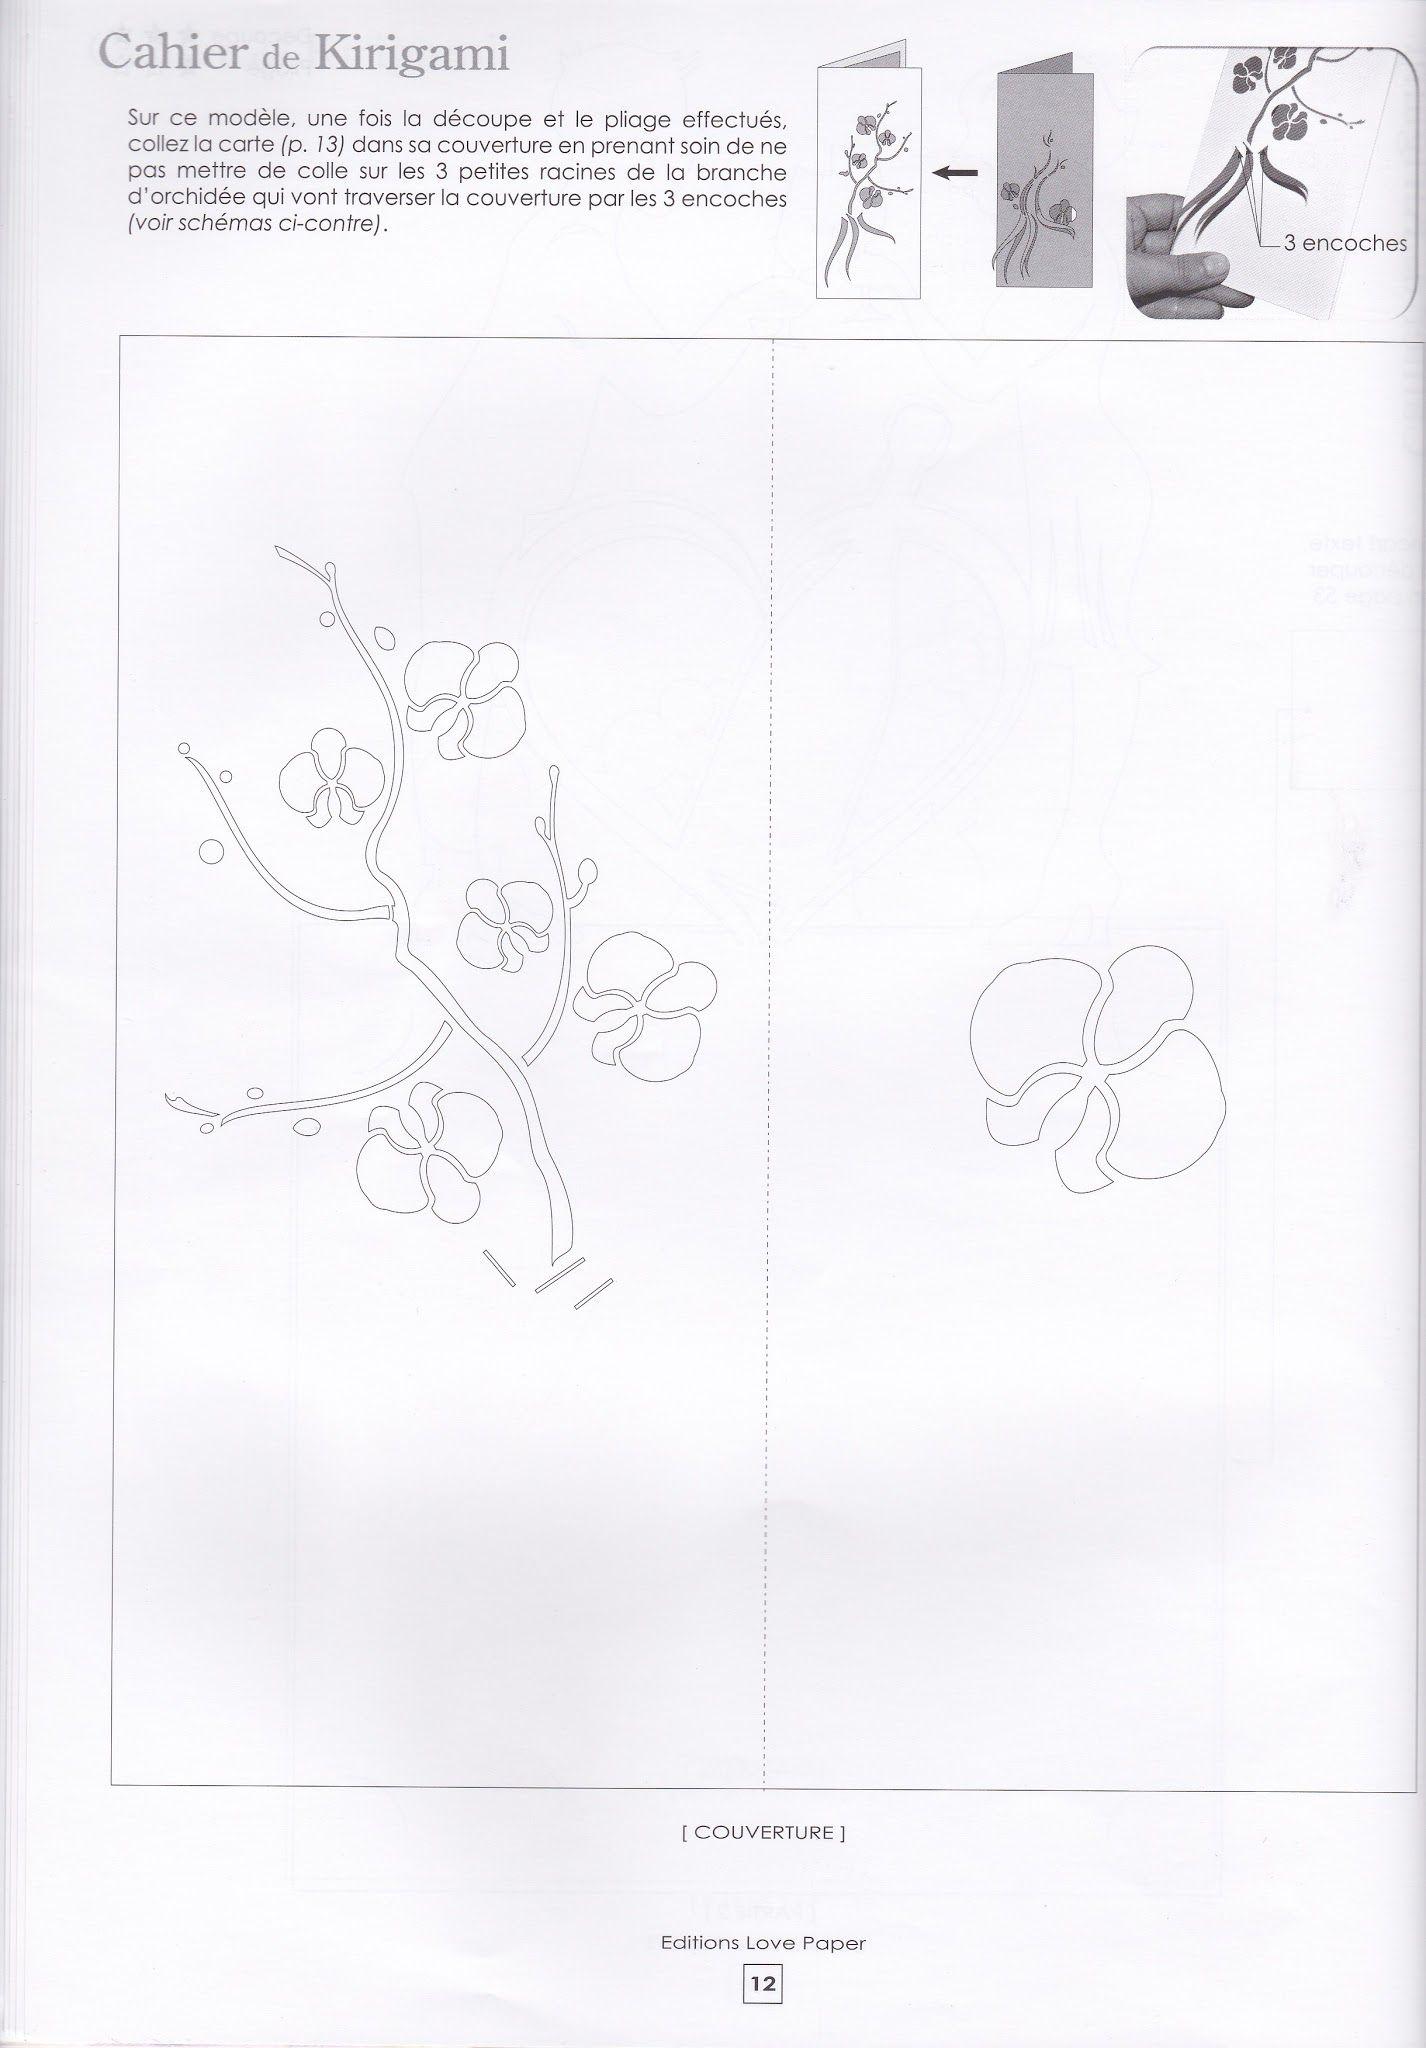 Lh3 Googleusercontent Com Zk6irhkdsmk V6ydmxbkeqi Aaaaaaaakqc Kx3dxvkiftmmkvn1ijhhpuxvr5ygghipa W1426 H2048 Cahier 2bde 2bk Kirigami Pop Up Cards Paper Crafts